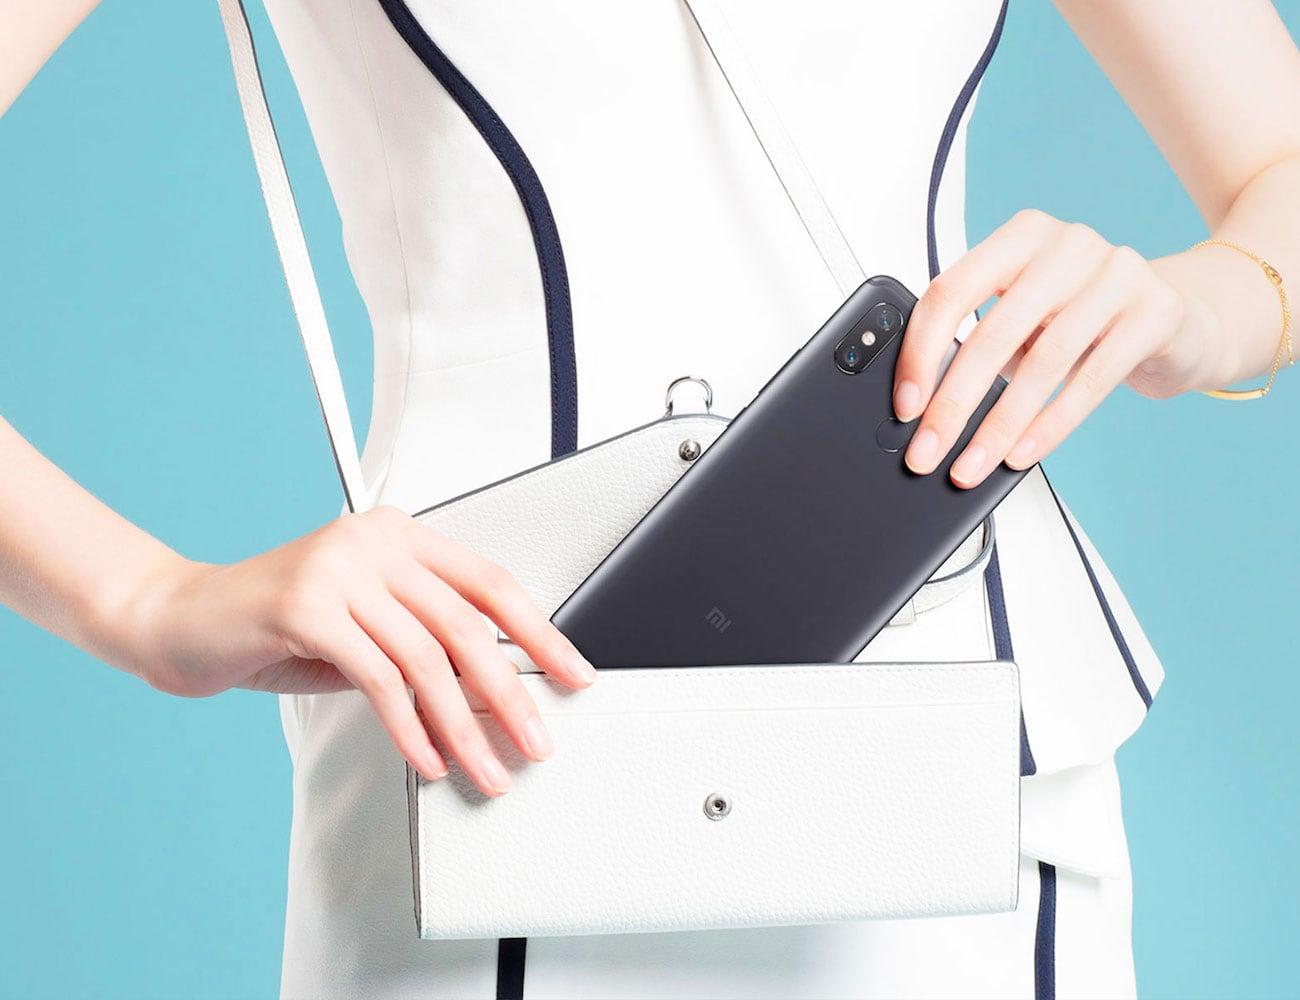 Xiaomi Mi Max 3 Full Screen Display Smartphone boasts a large screen